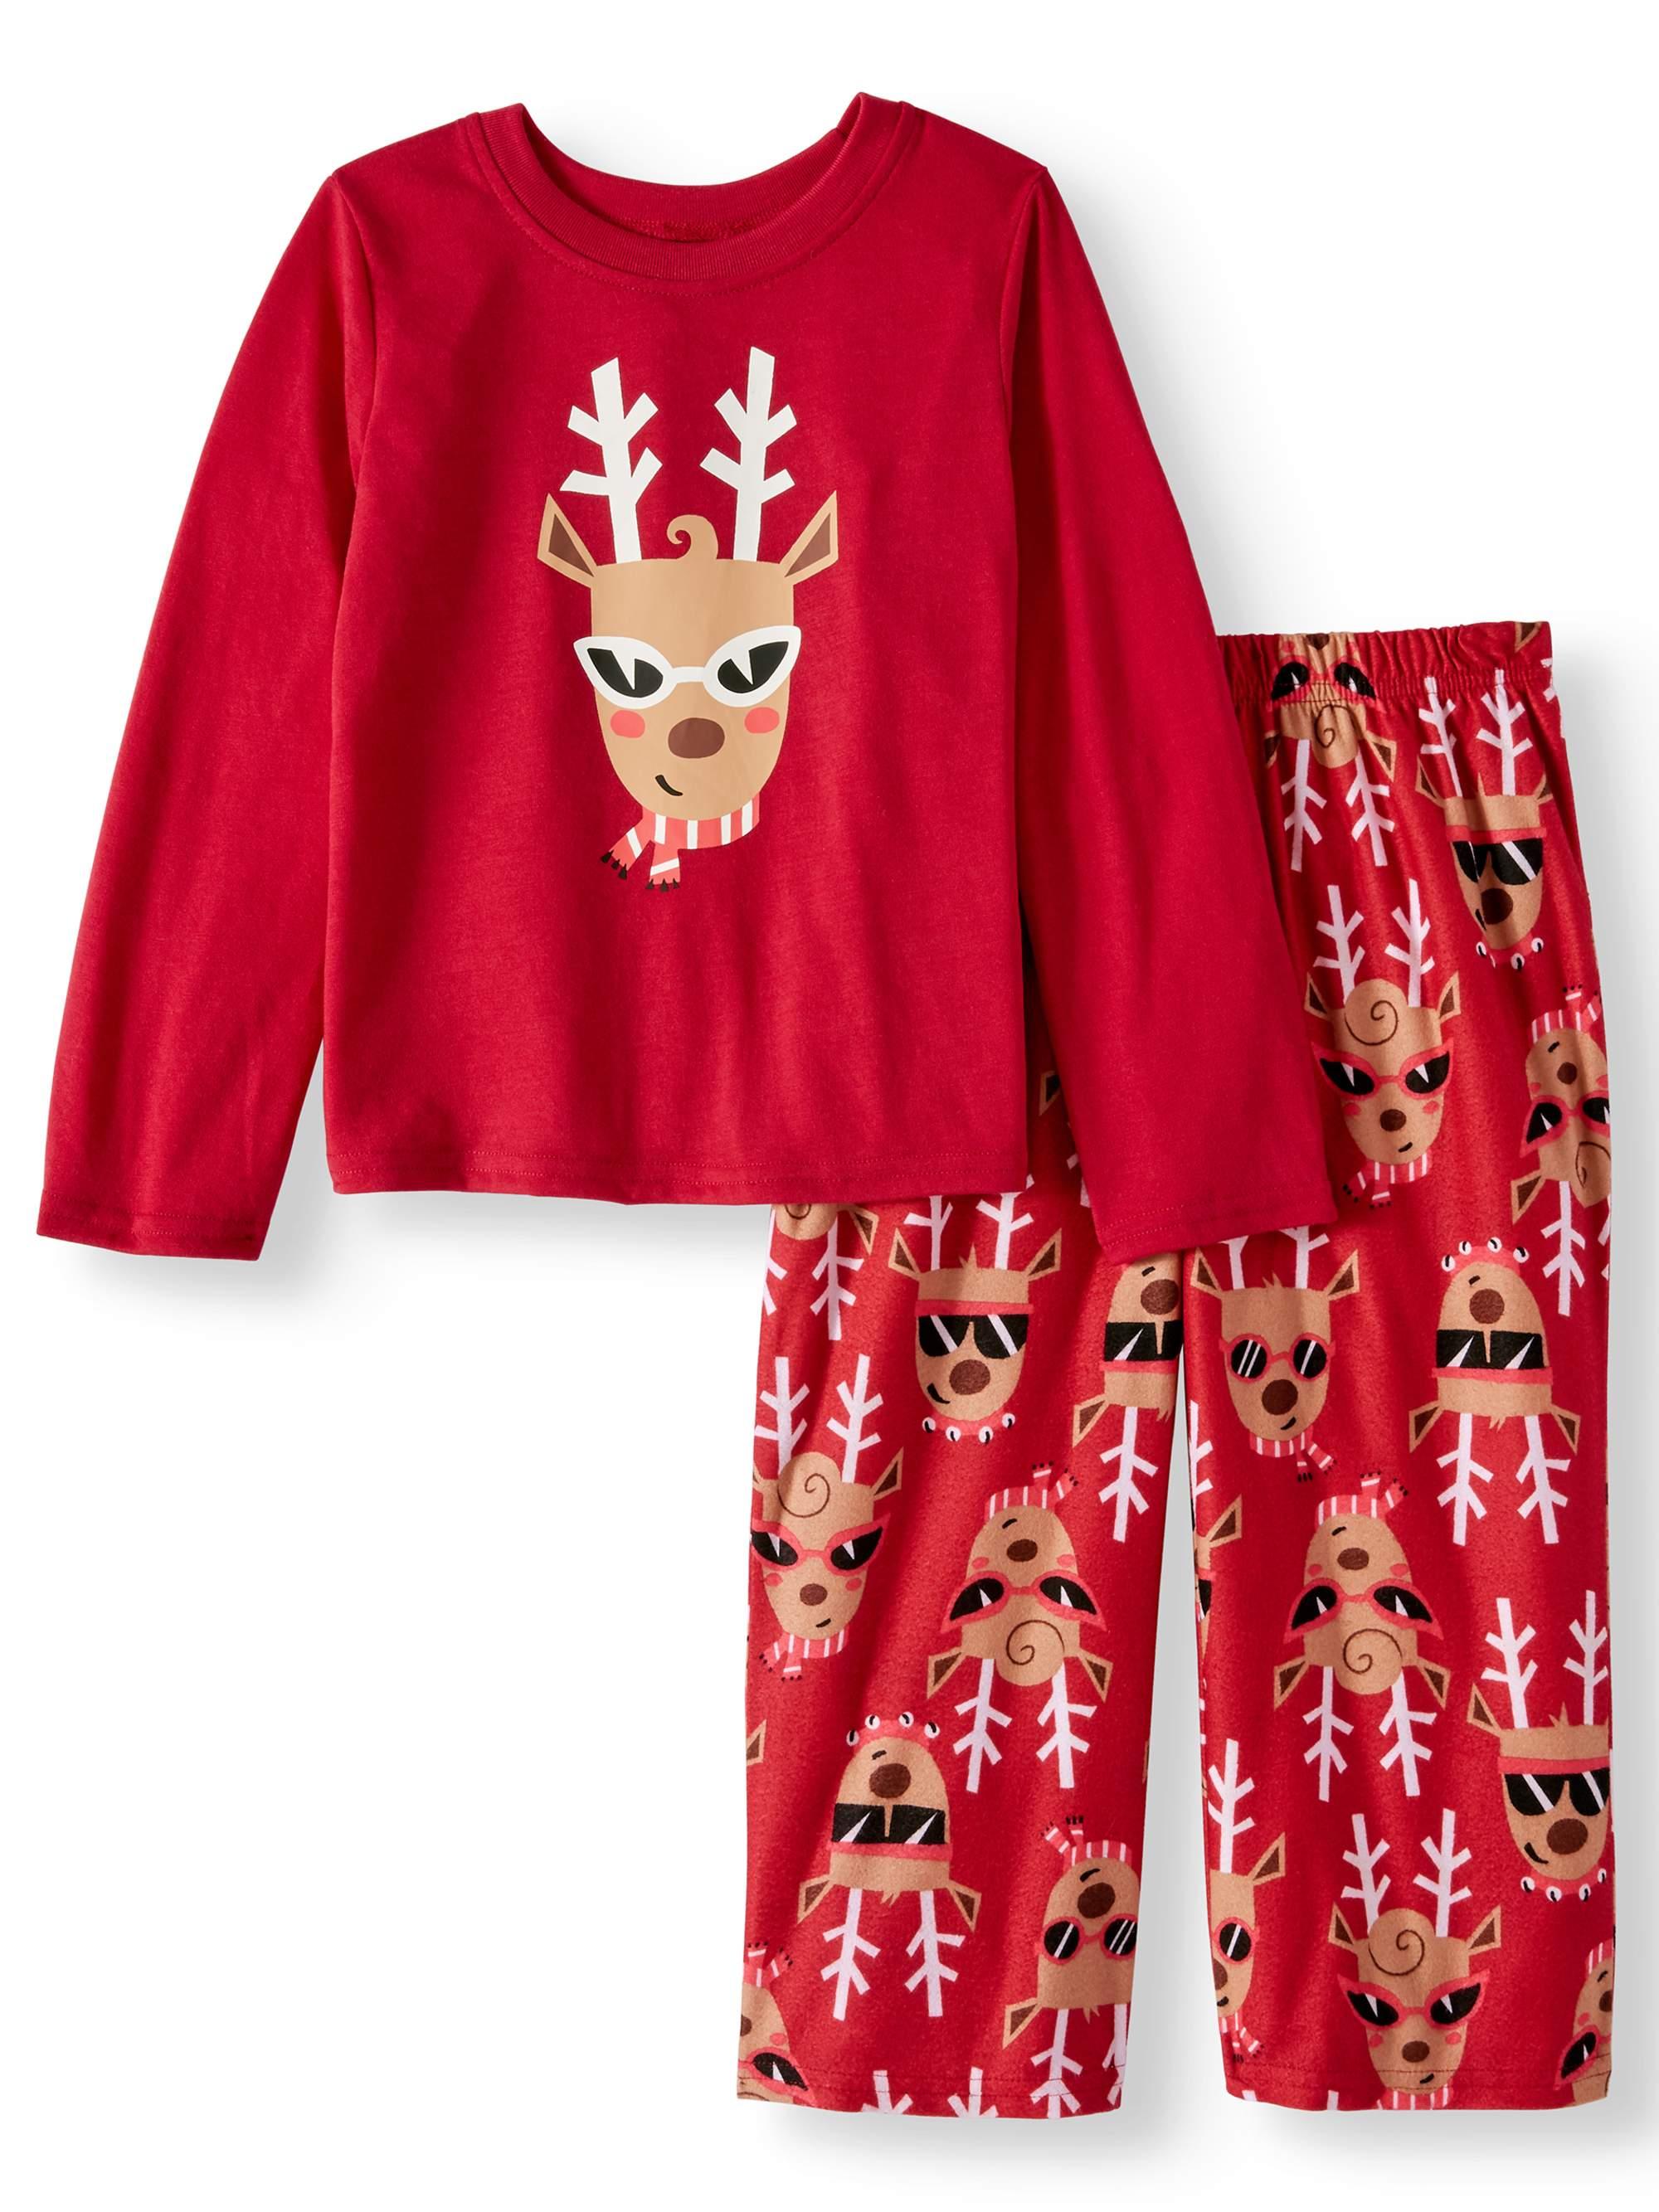 Holiday Family Sleep Reindeer Jersey Long Sleeve Top and Brushed Micro Jersey Pant, 2-piece Pajama Set (Toddler Girls)